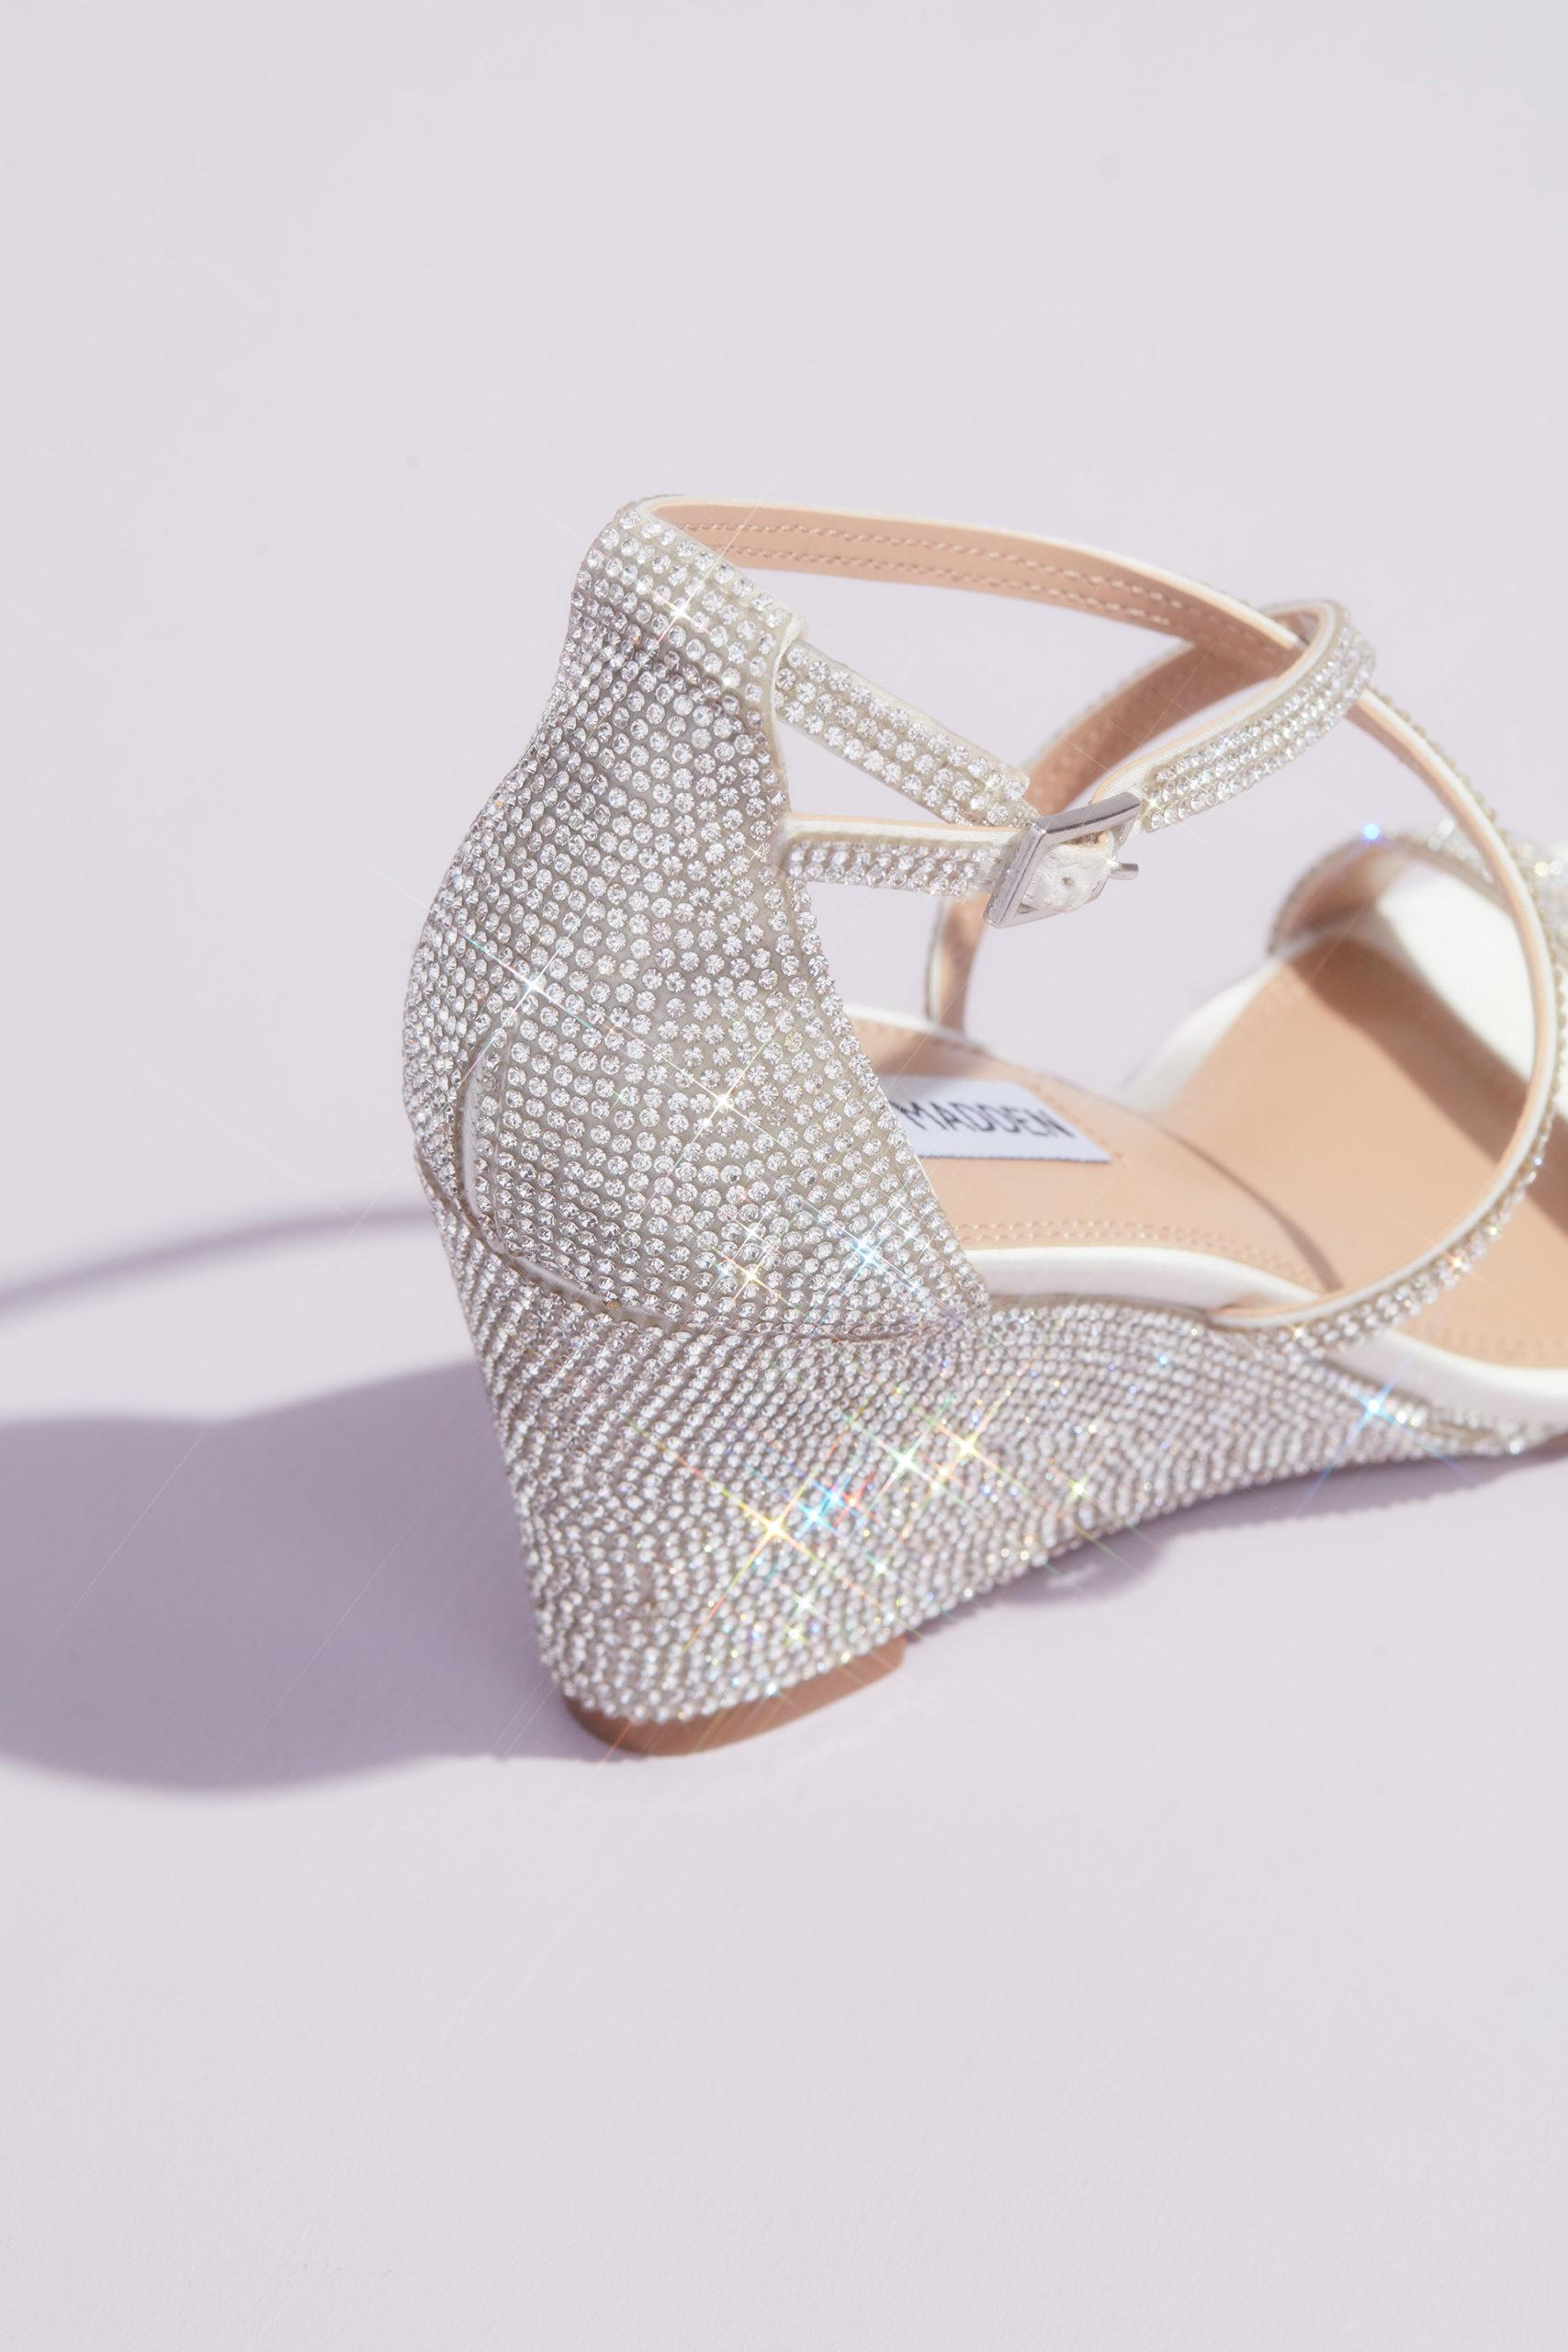 detail shot of Crystal Crisscross Strap Wedge Sandals